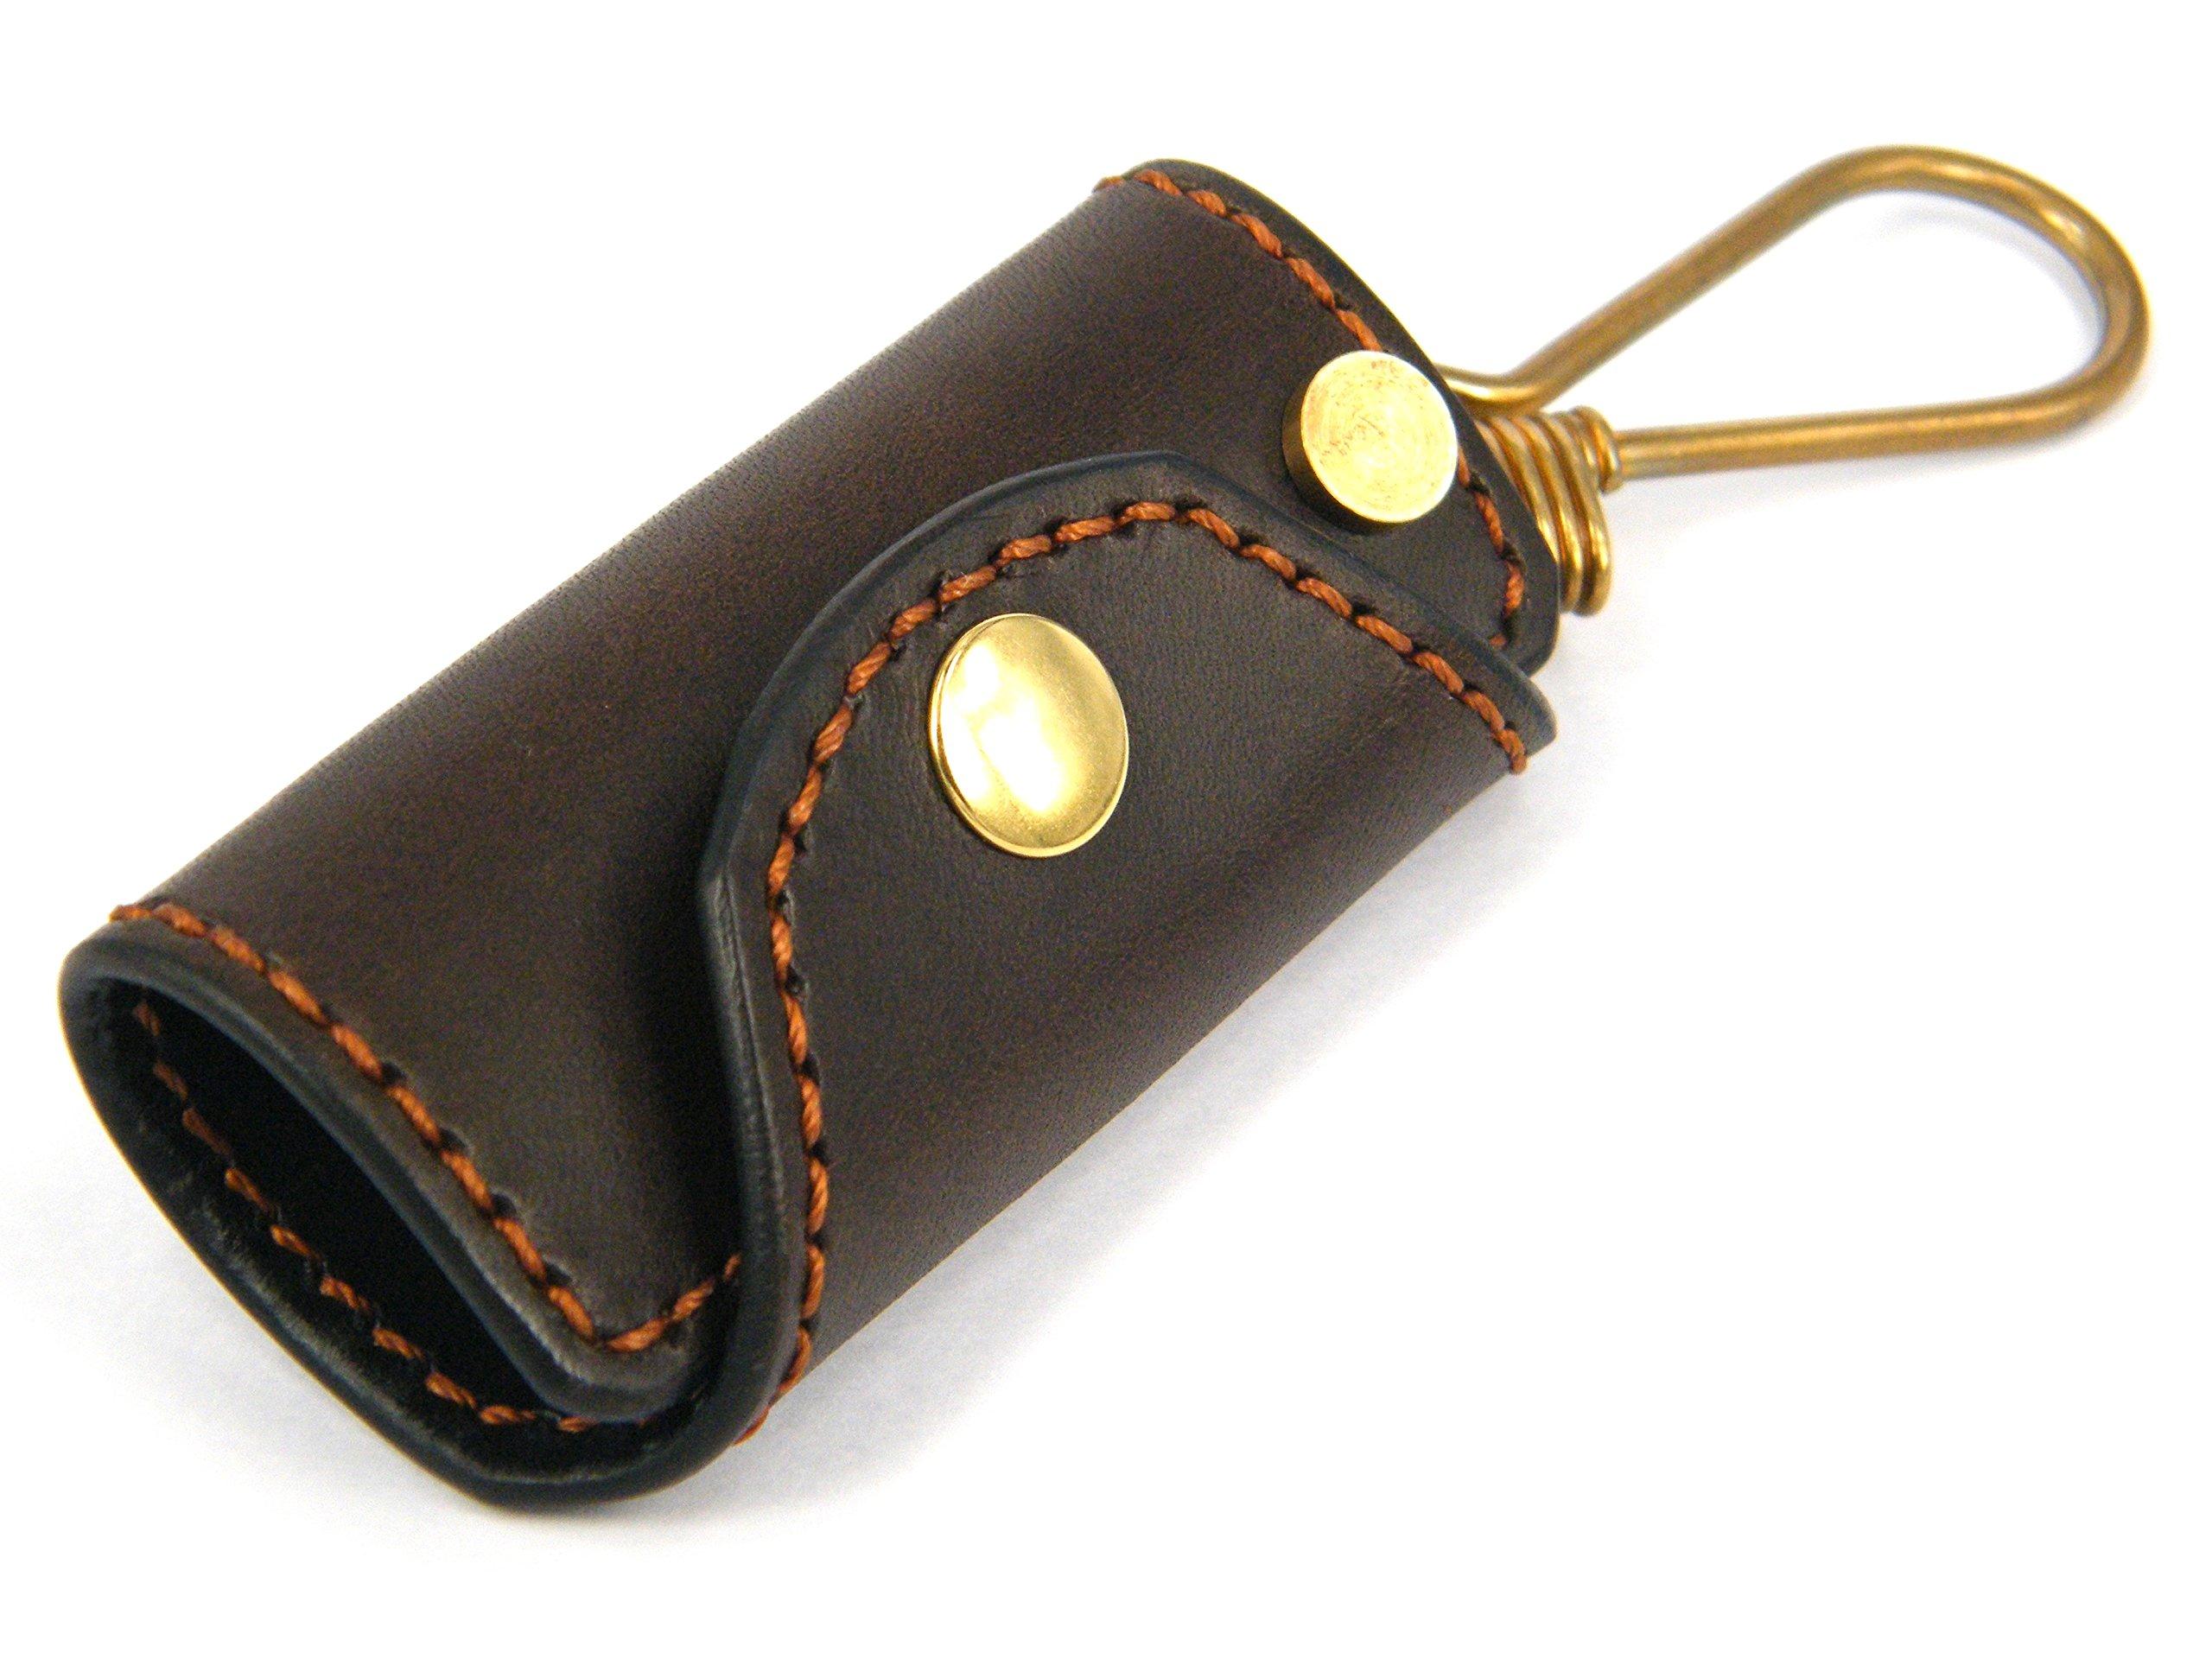 Spiff Leather Handmade Buttero Minimalist Key Case III, Espresso